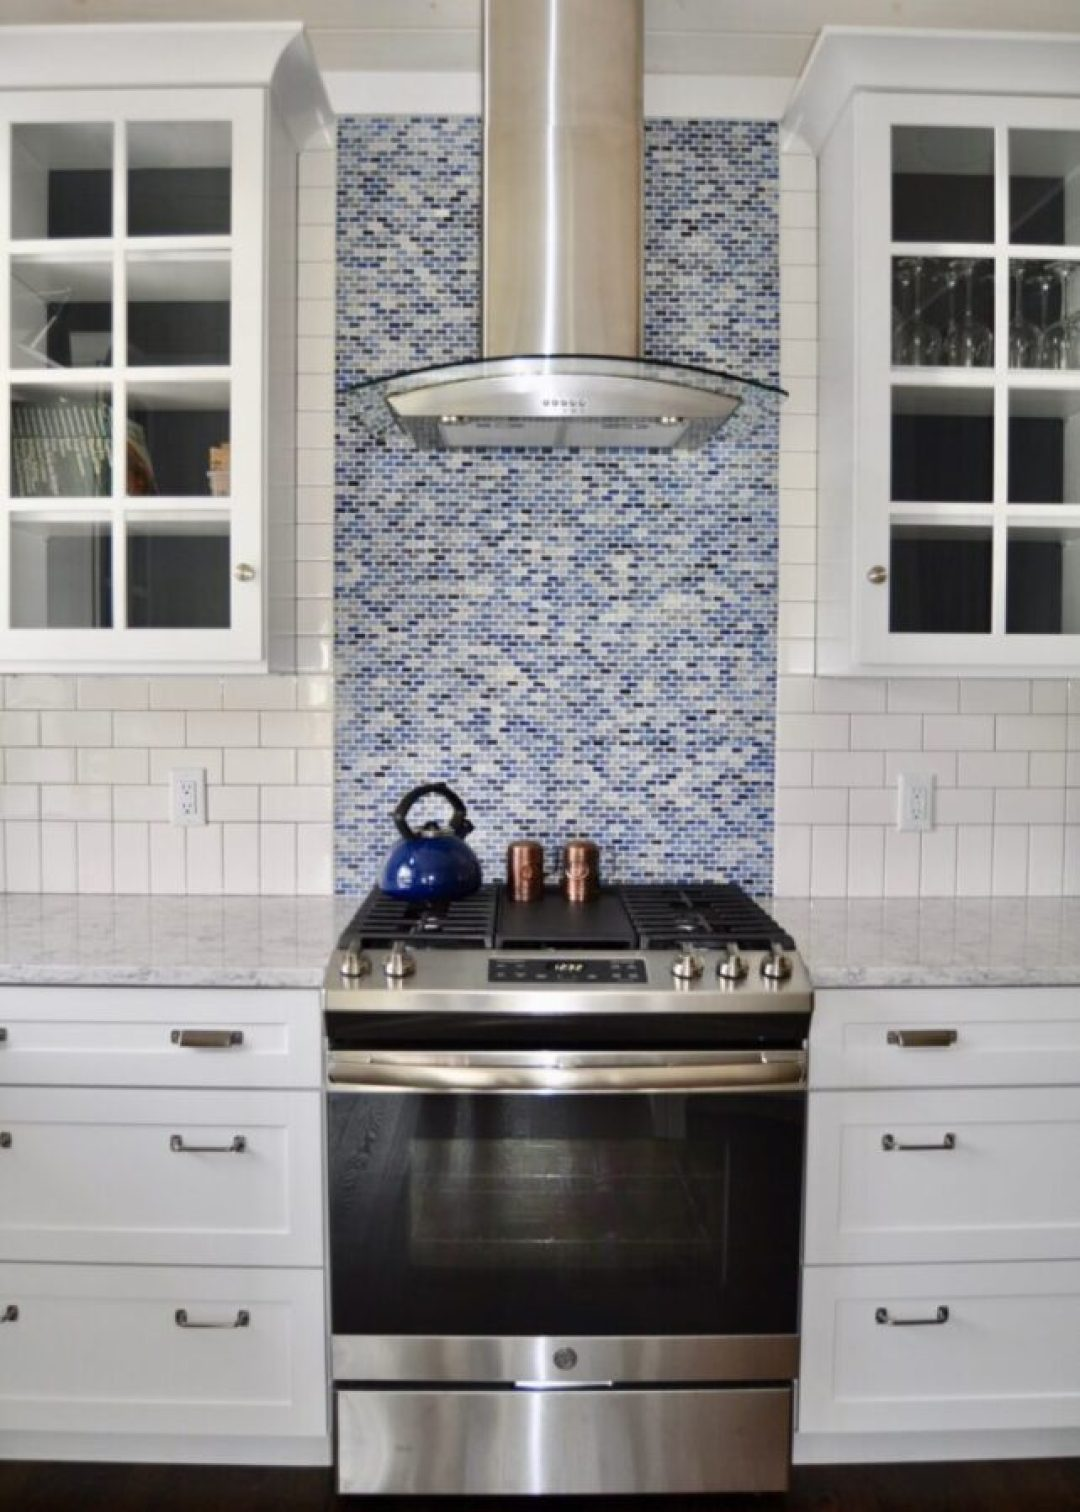 Subway tile & blue backsplash behind the range